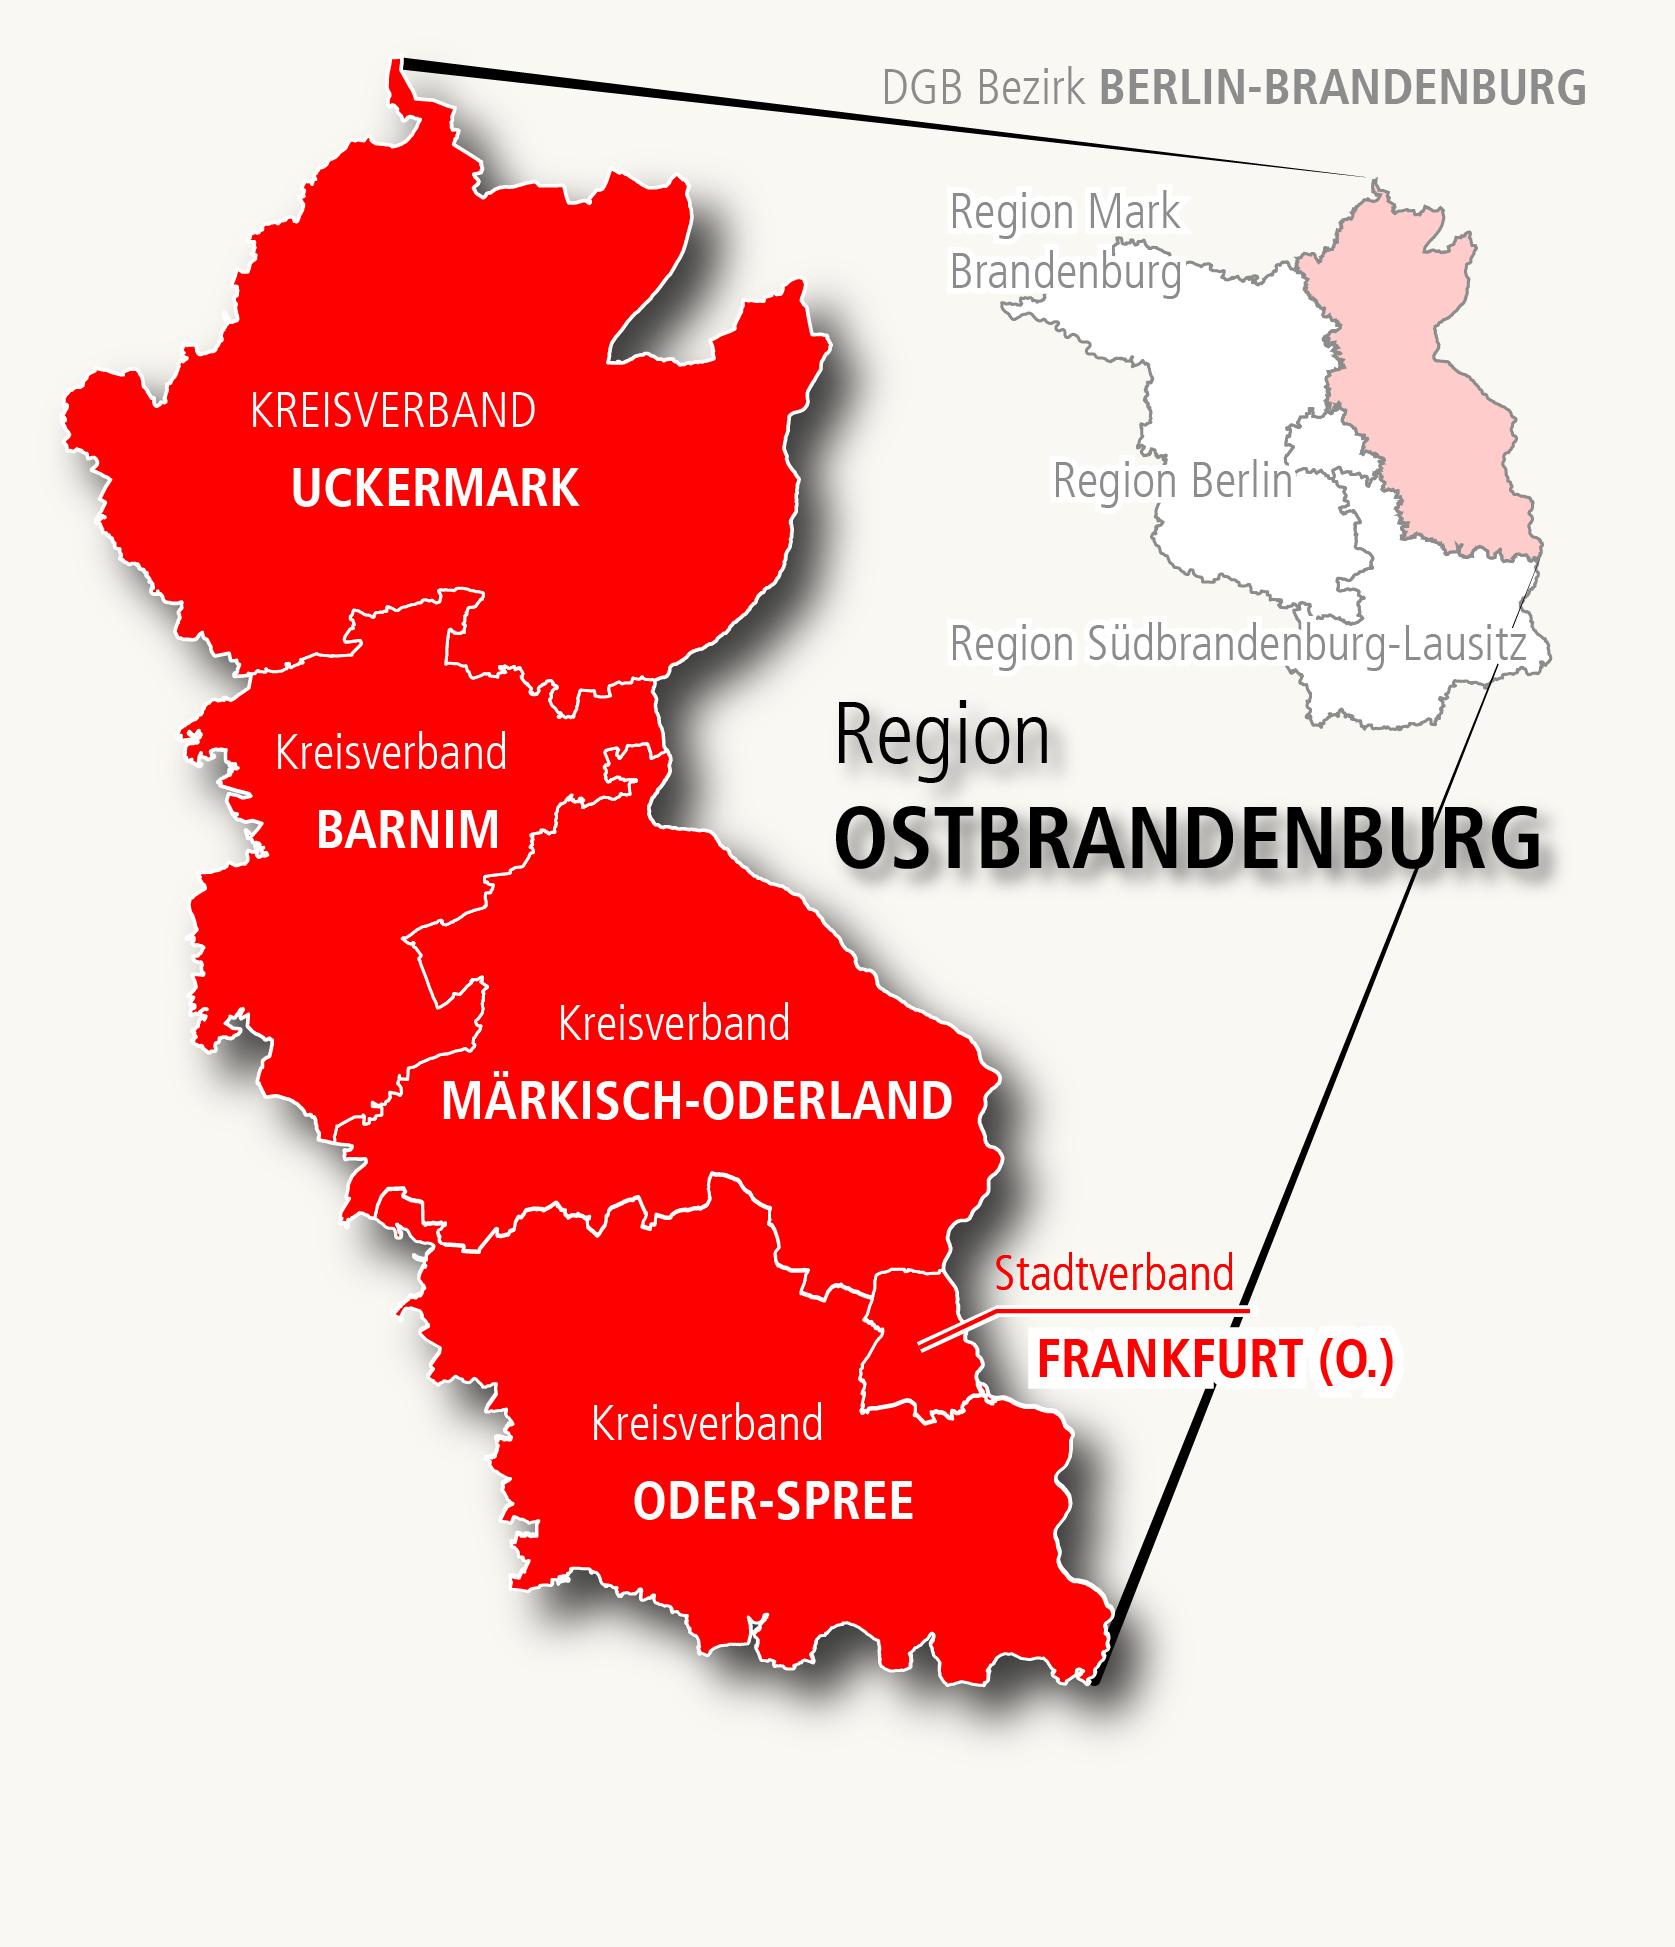 DGB-Region Ostbrandenburg